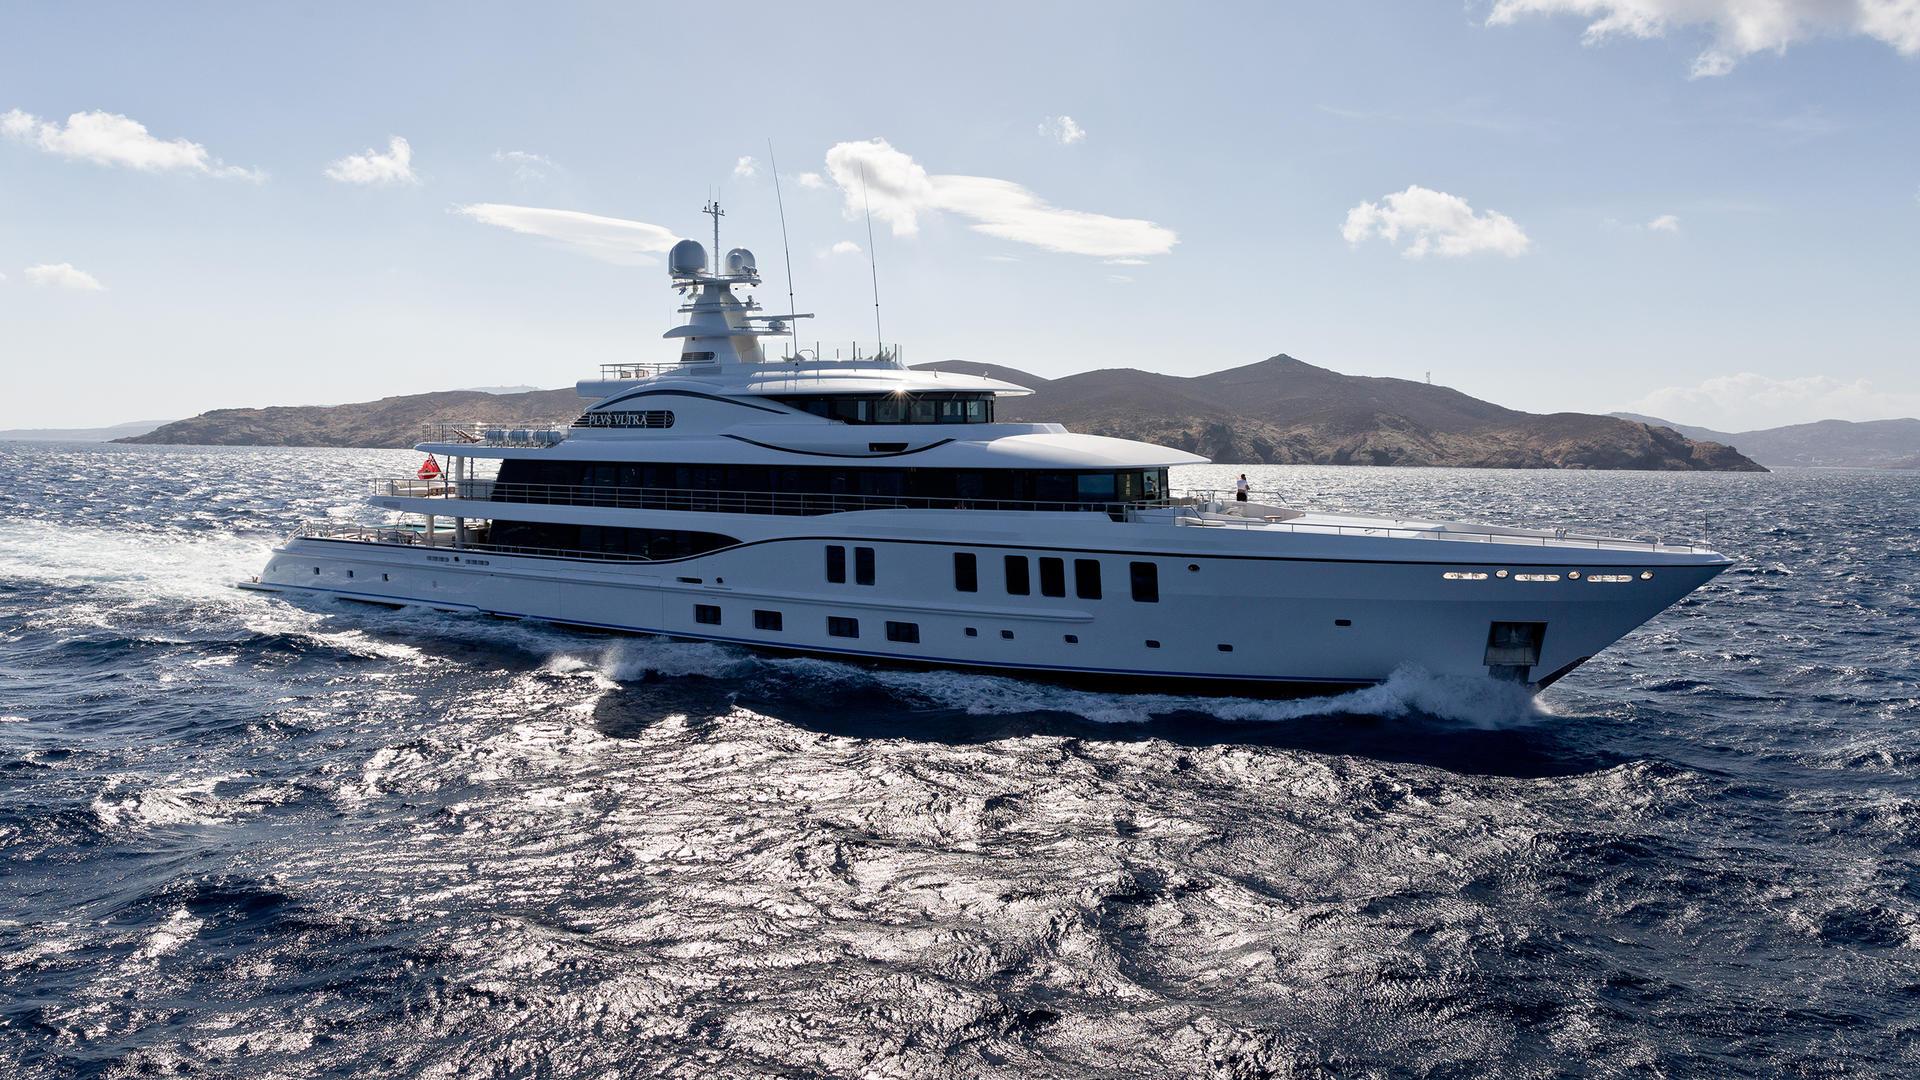 xG1rYOxmTuaJ44AzJSd1_Plvs-Vltra-Amels-LE242-yacht-hero-credit-Jeff-Brown-1920x1080